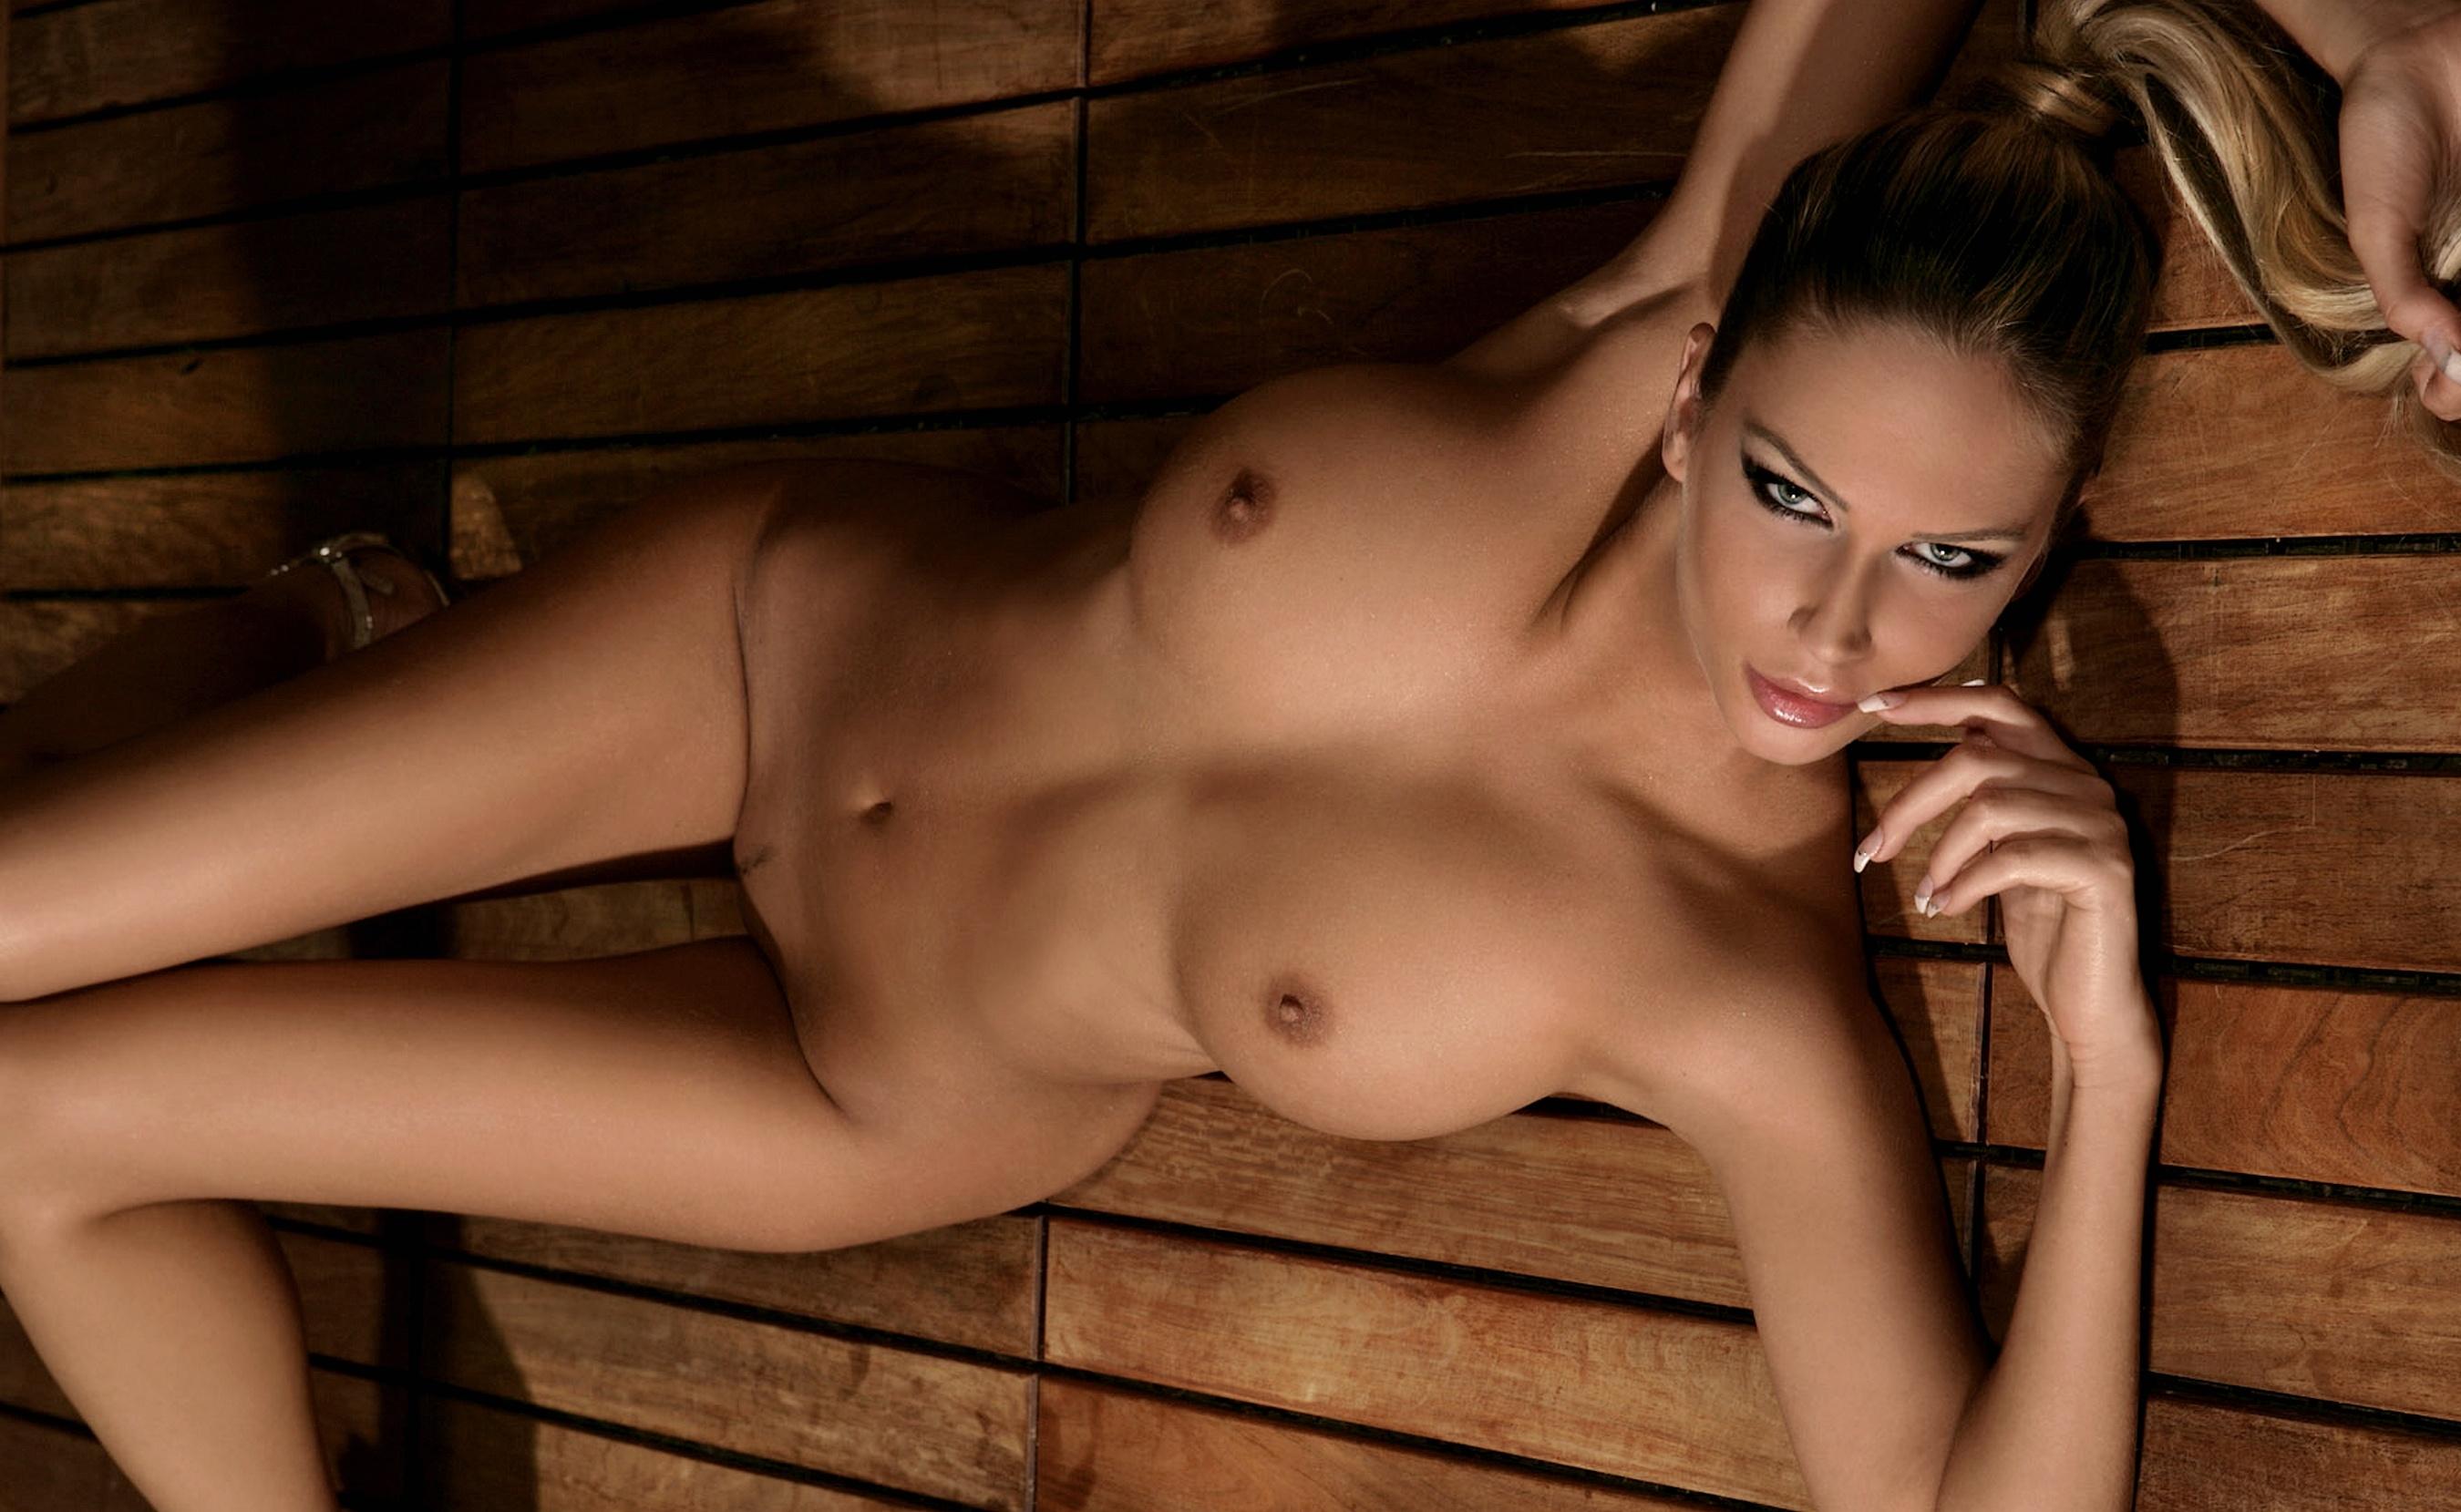 Wallpaper andrea jarova, playmate, nude, model, thin, big tits ...